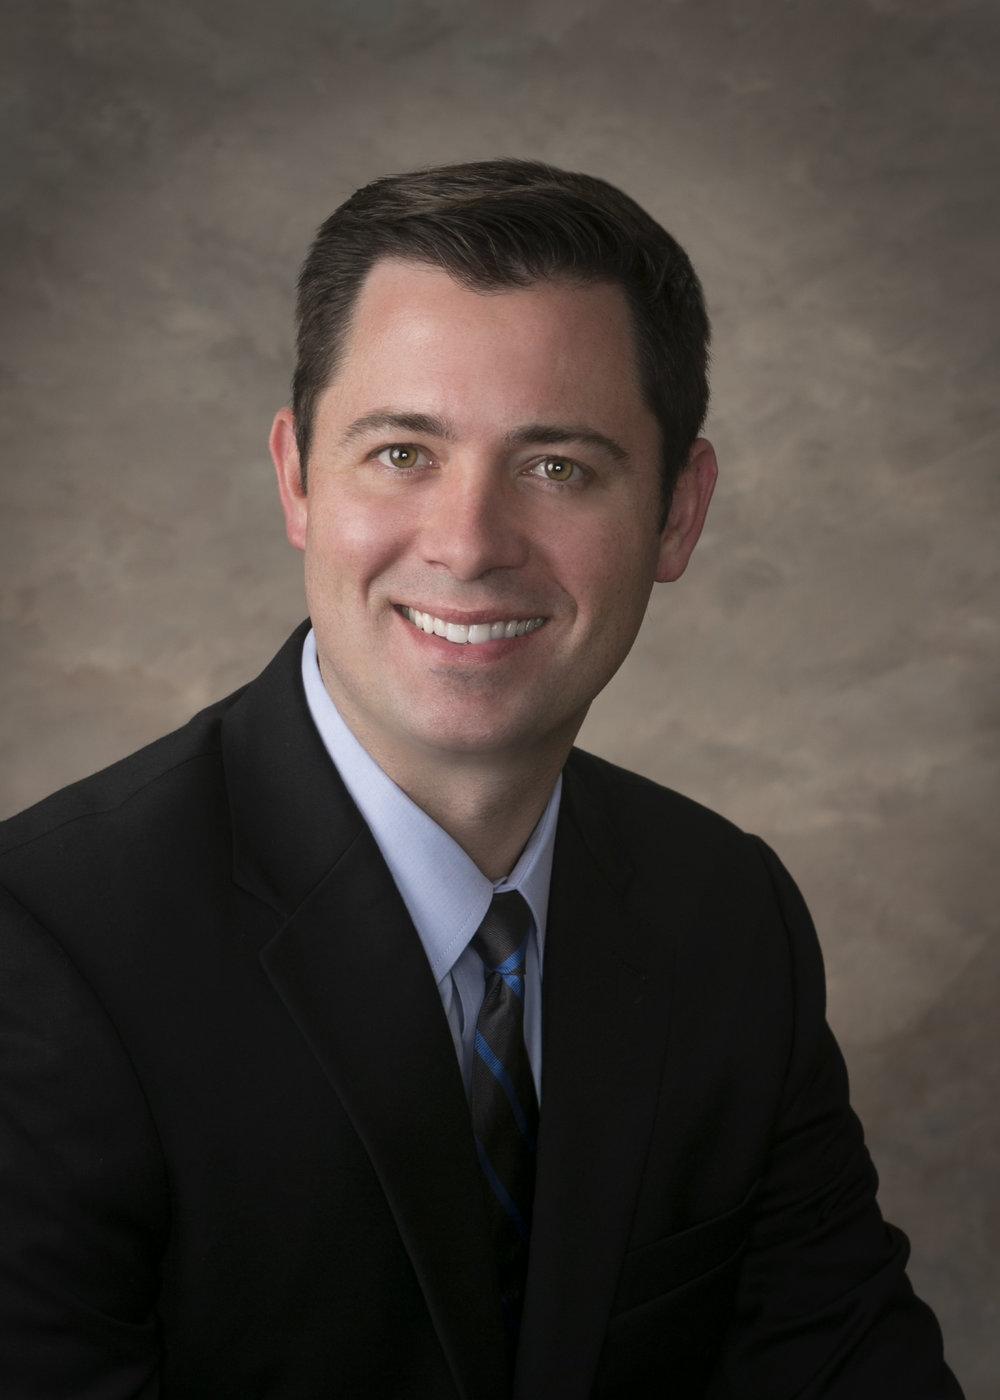 John Jessen - Vice President